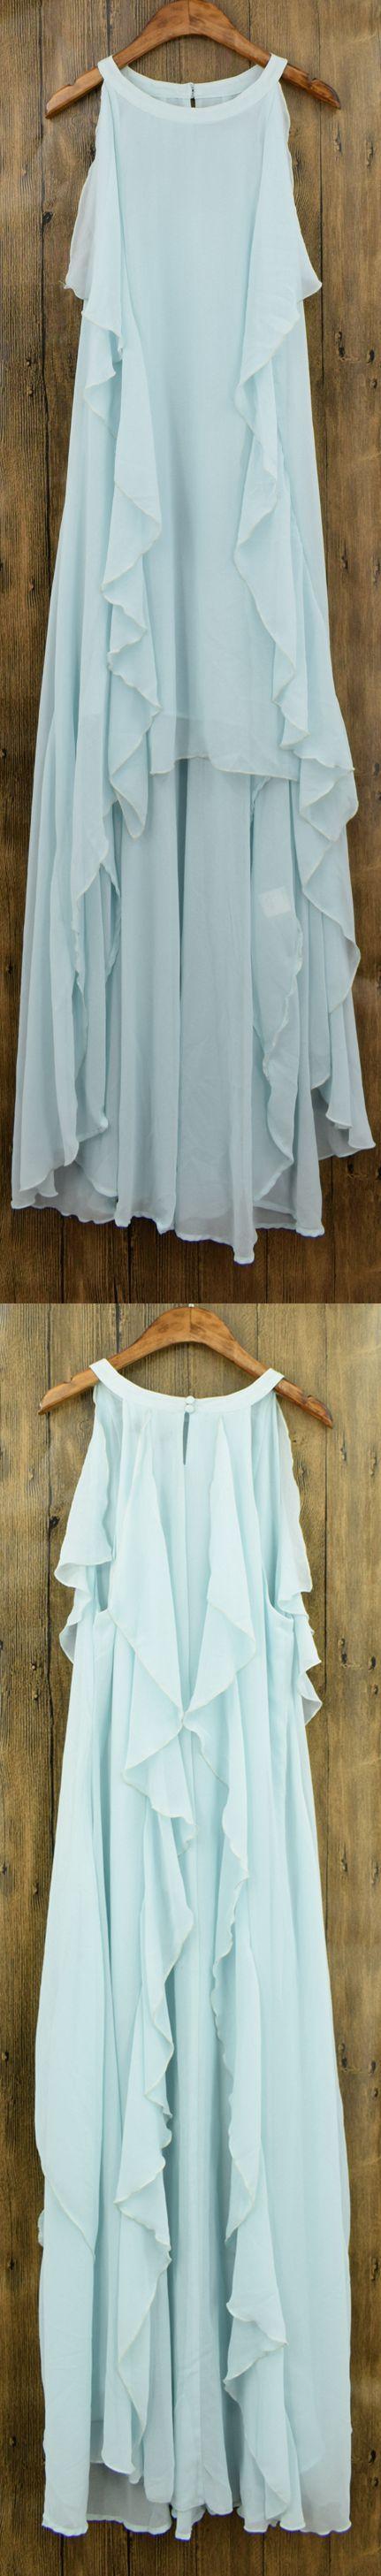 Women's Flounce Decor Sleeveless Asymmetric Chiffon Dress.Check more from www.azbro.com .                                                                                                                                                     More